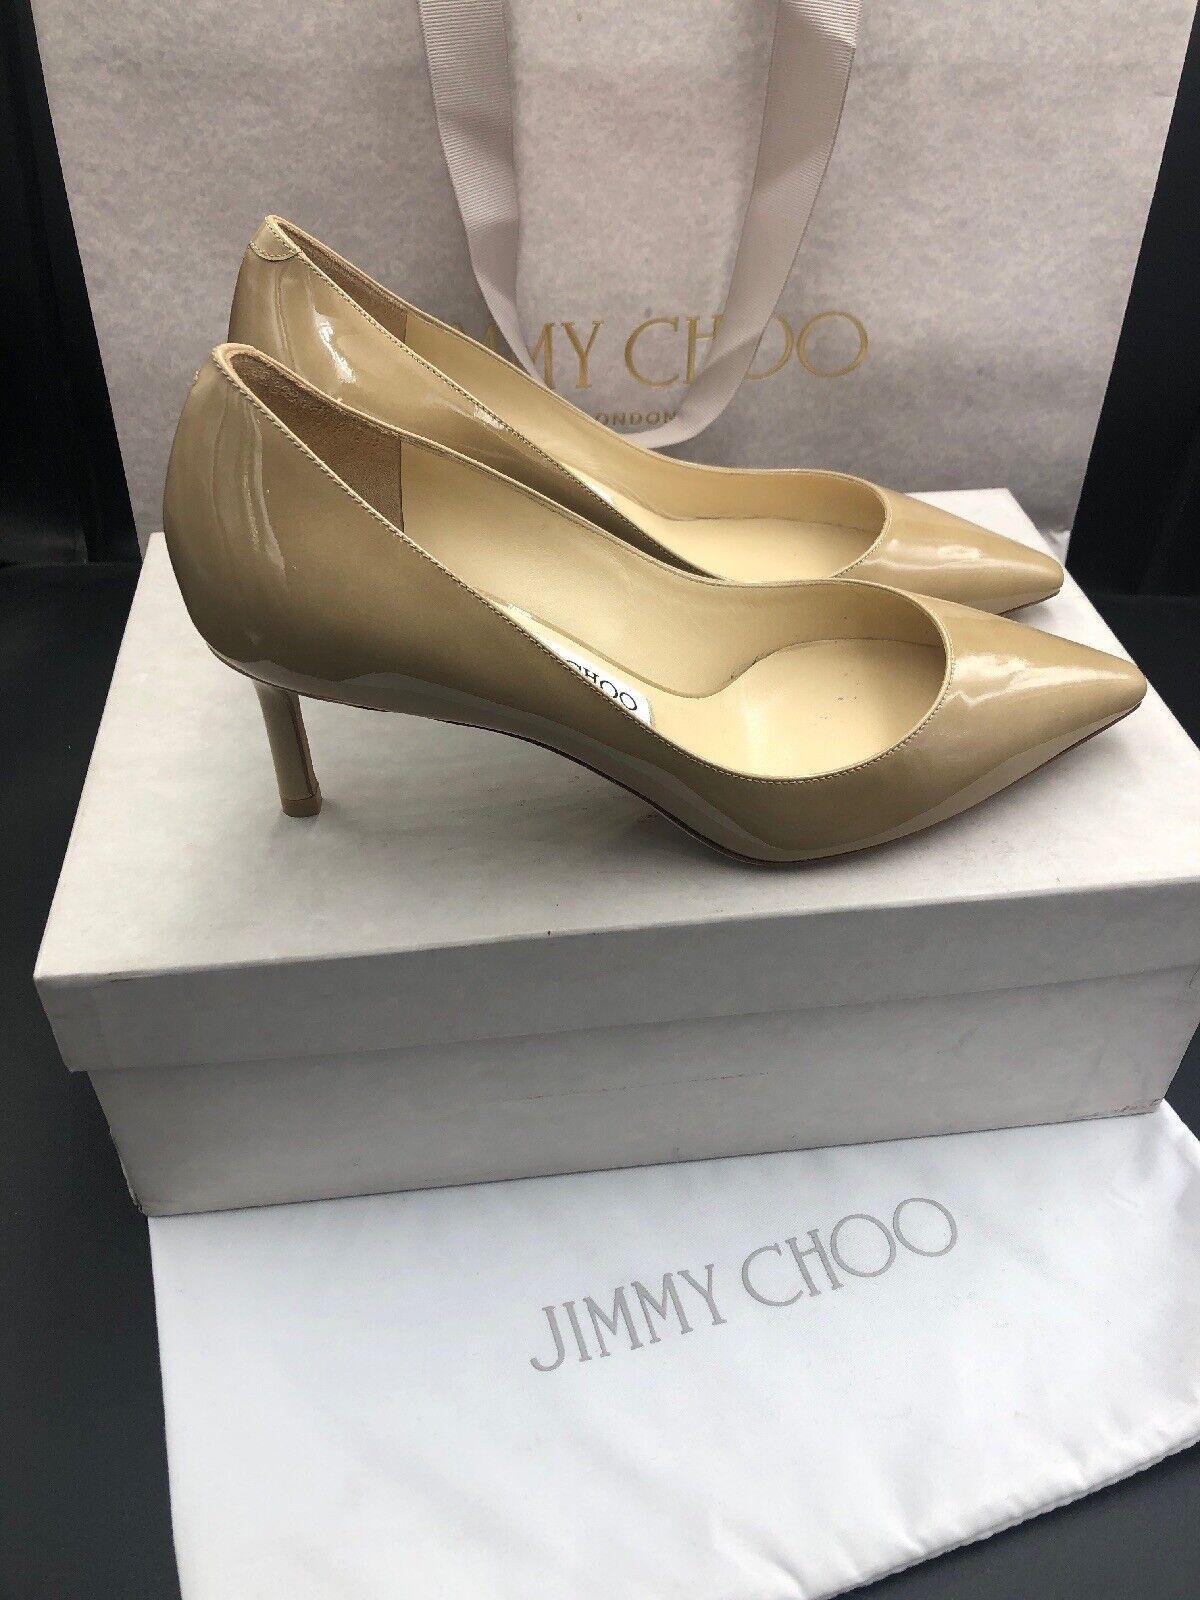 Jimmy Choo Romy 60 Nude Patent Mid Heels Pumps schuhe Größe Uk 3 Eu 36 Rrp